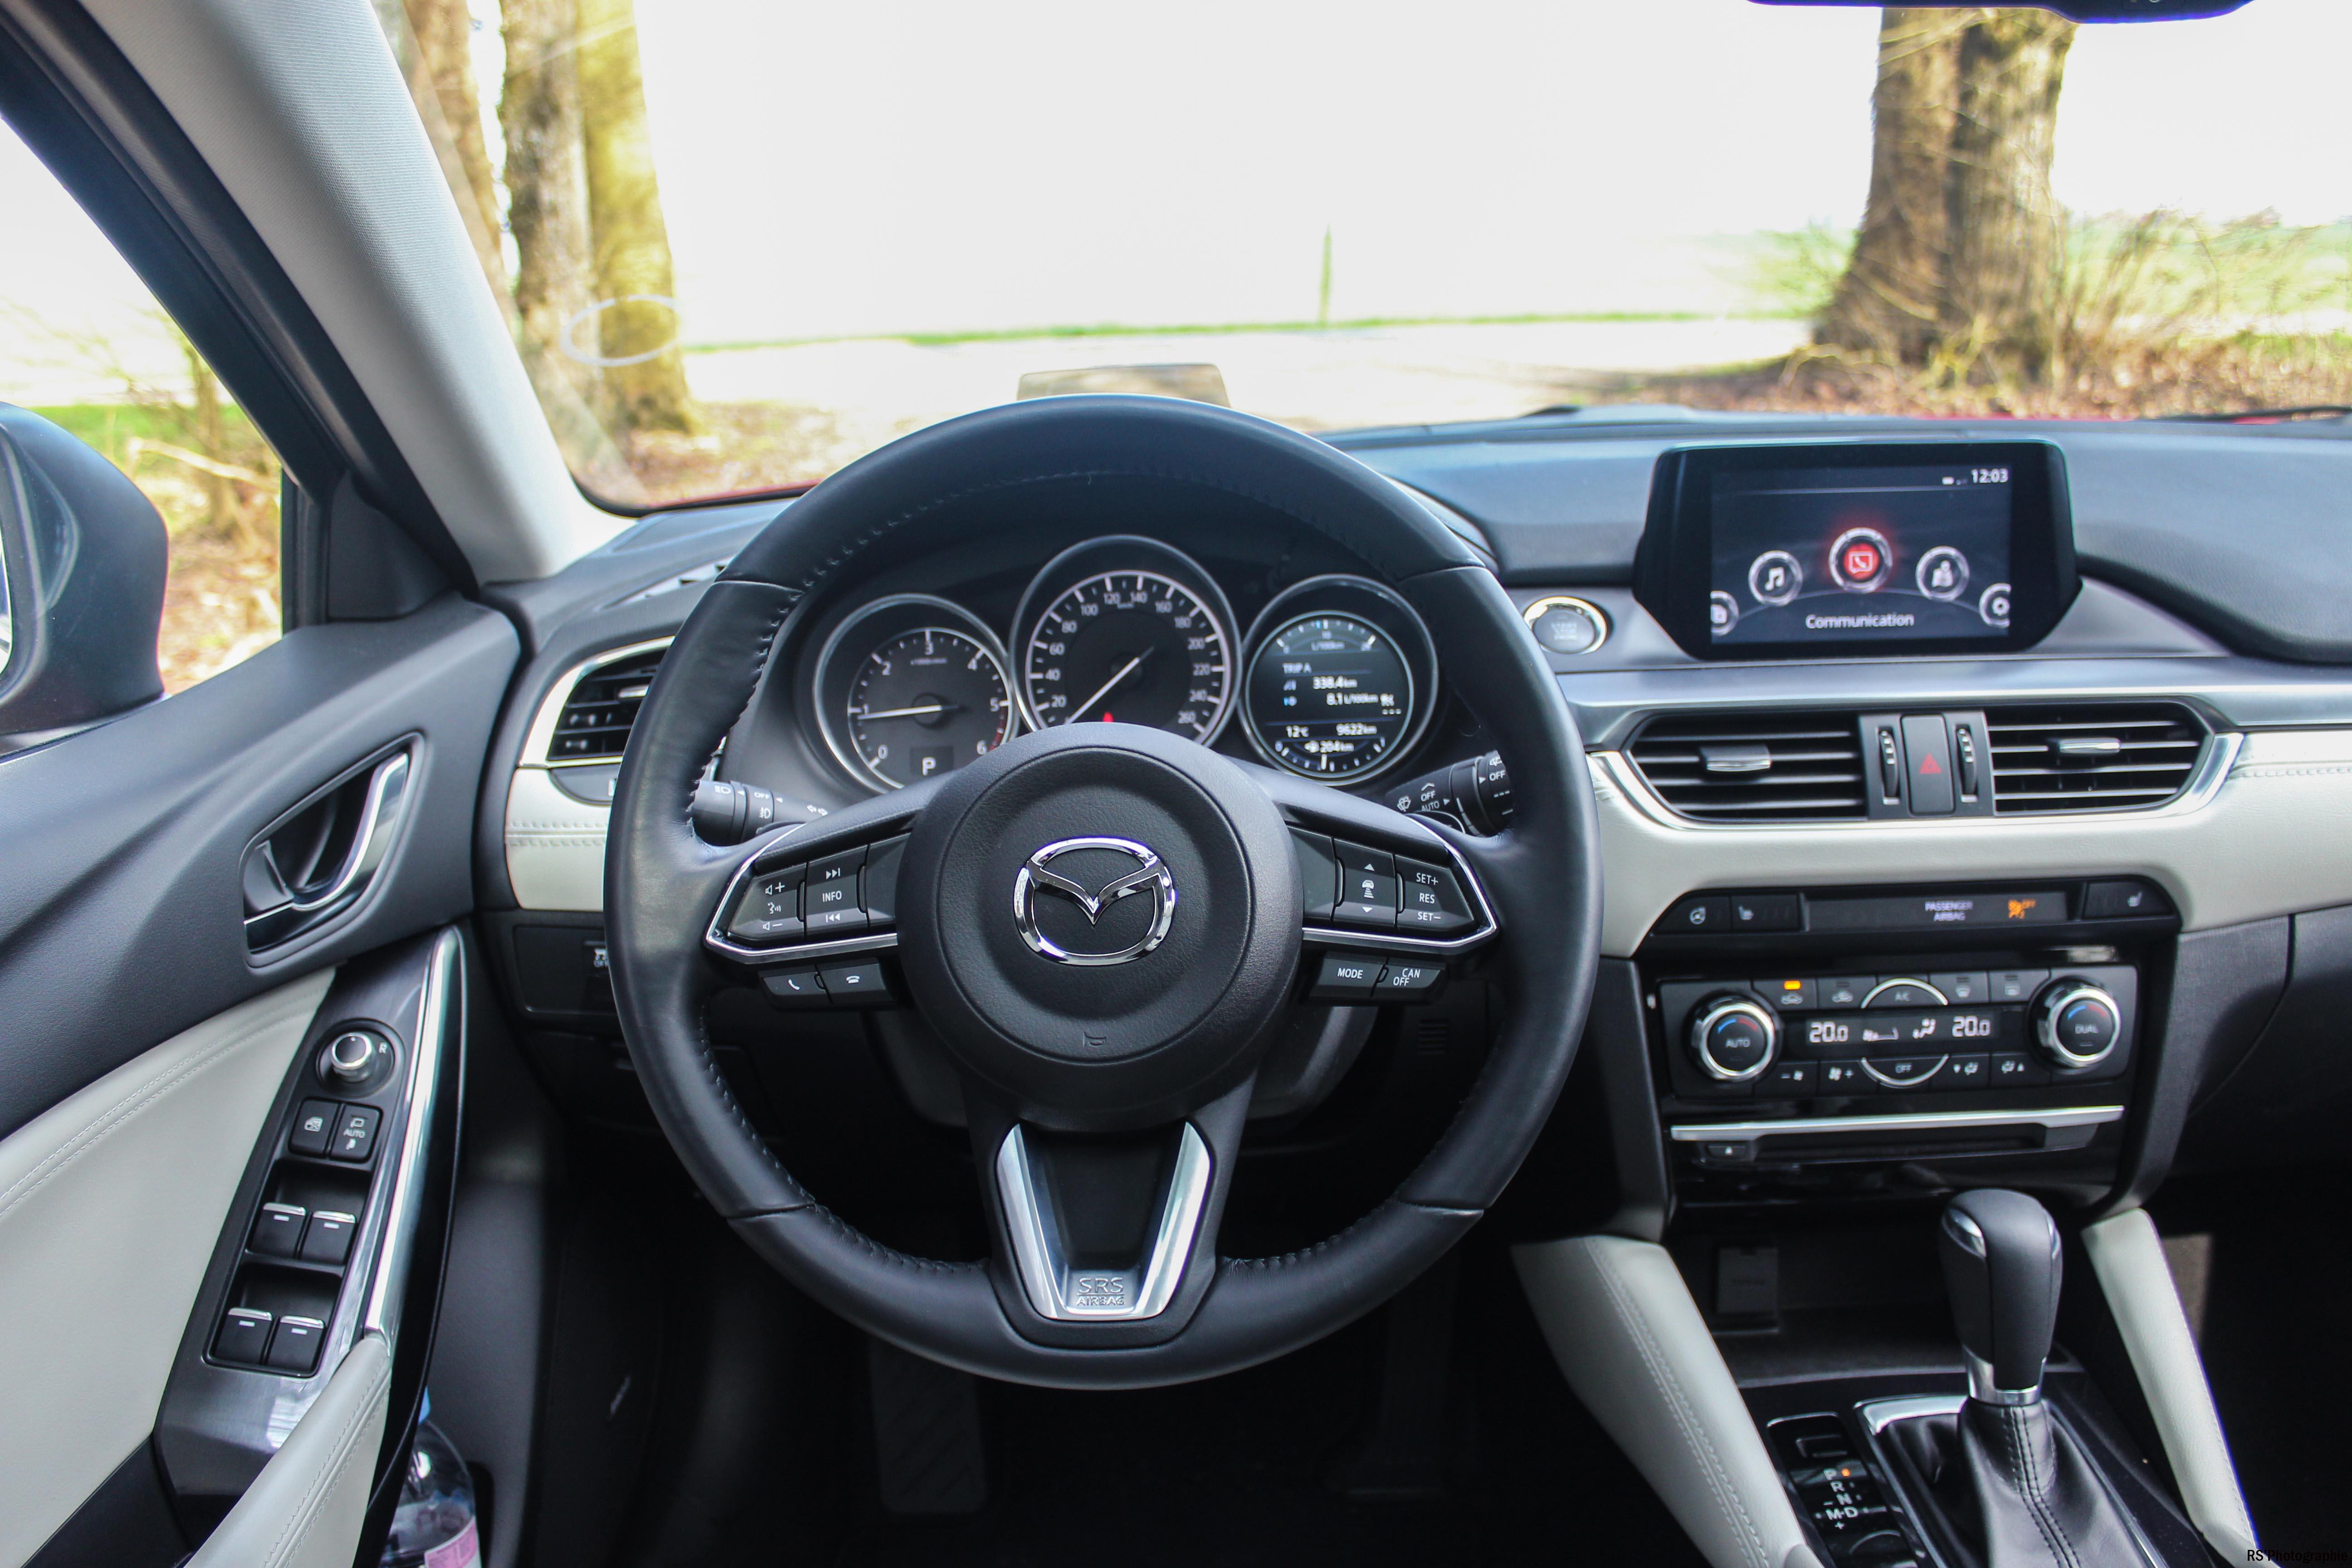 Mazda6SW27-mazda-6-sw-intérieur-onboard-arnaud-demasier-rsphotographie